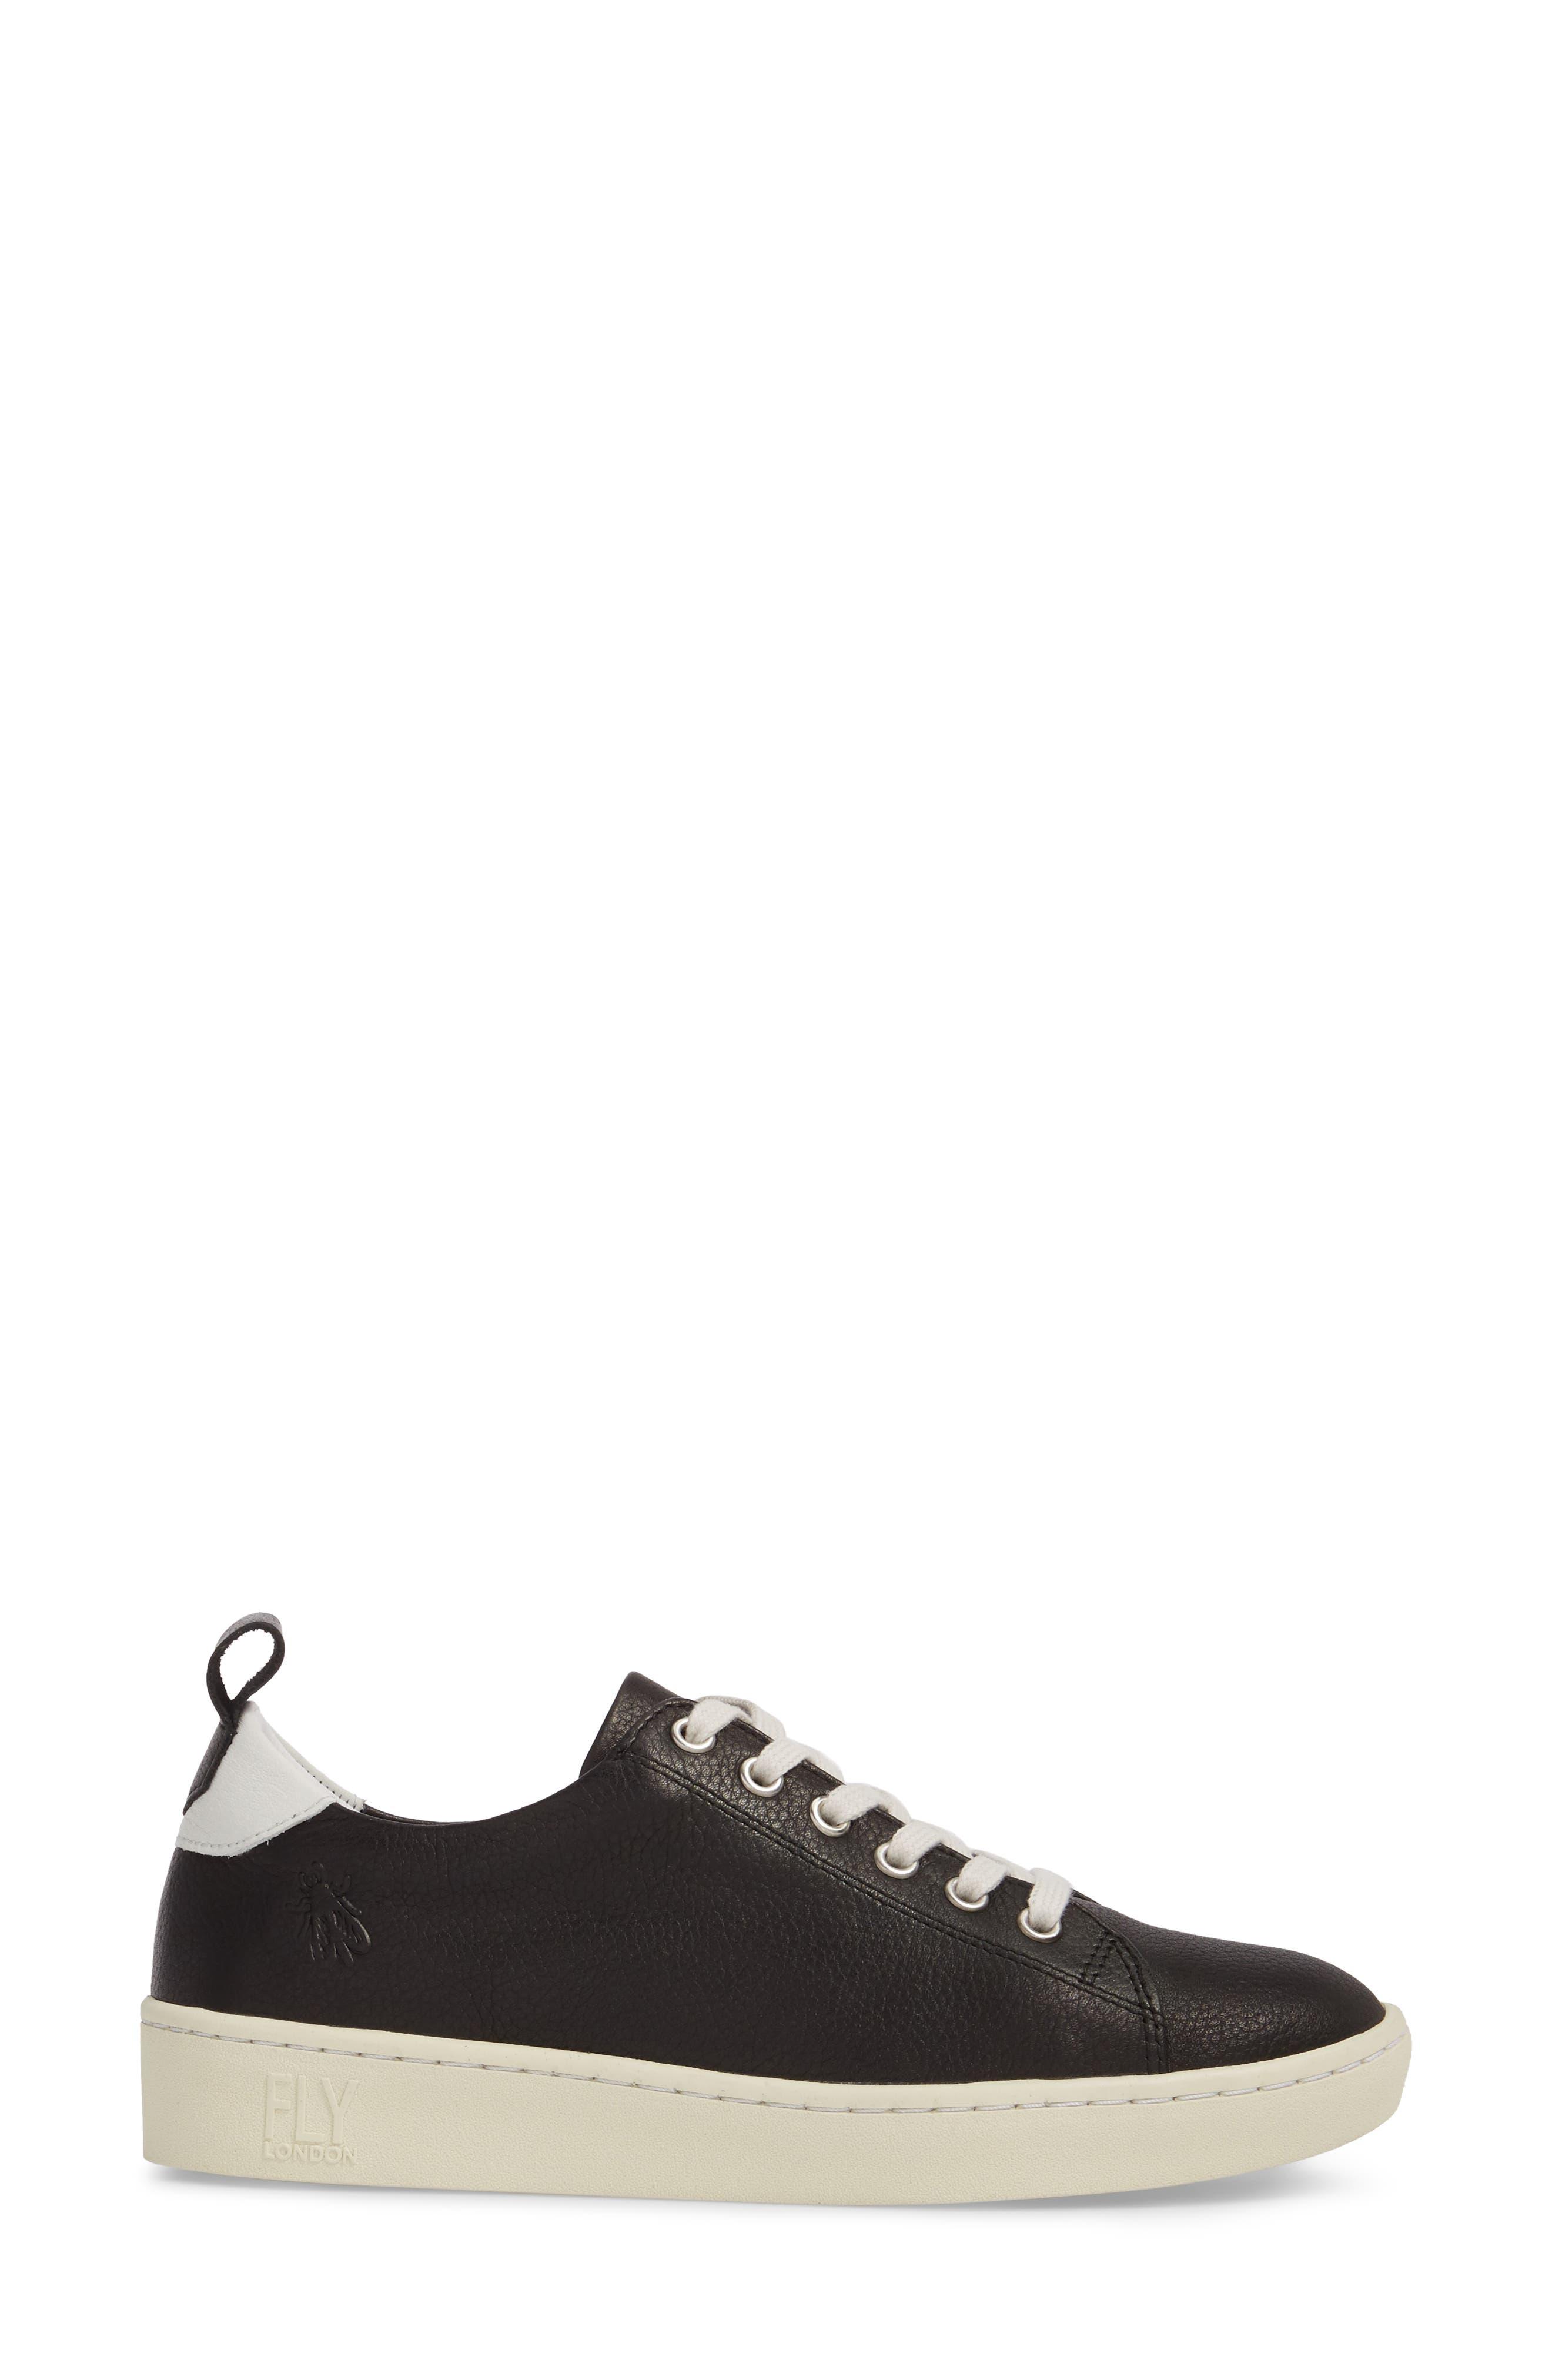 Maku Lace-Up Sneaker,                             Alternate thumbnail 3, color,                             BLACK BRITO LEATHER